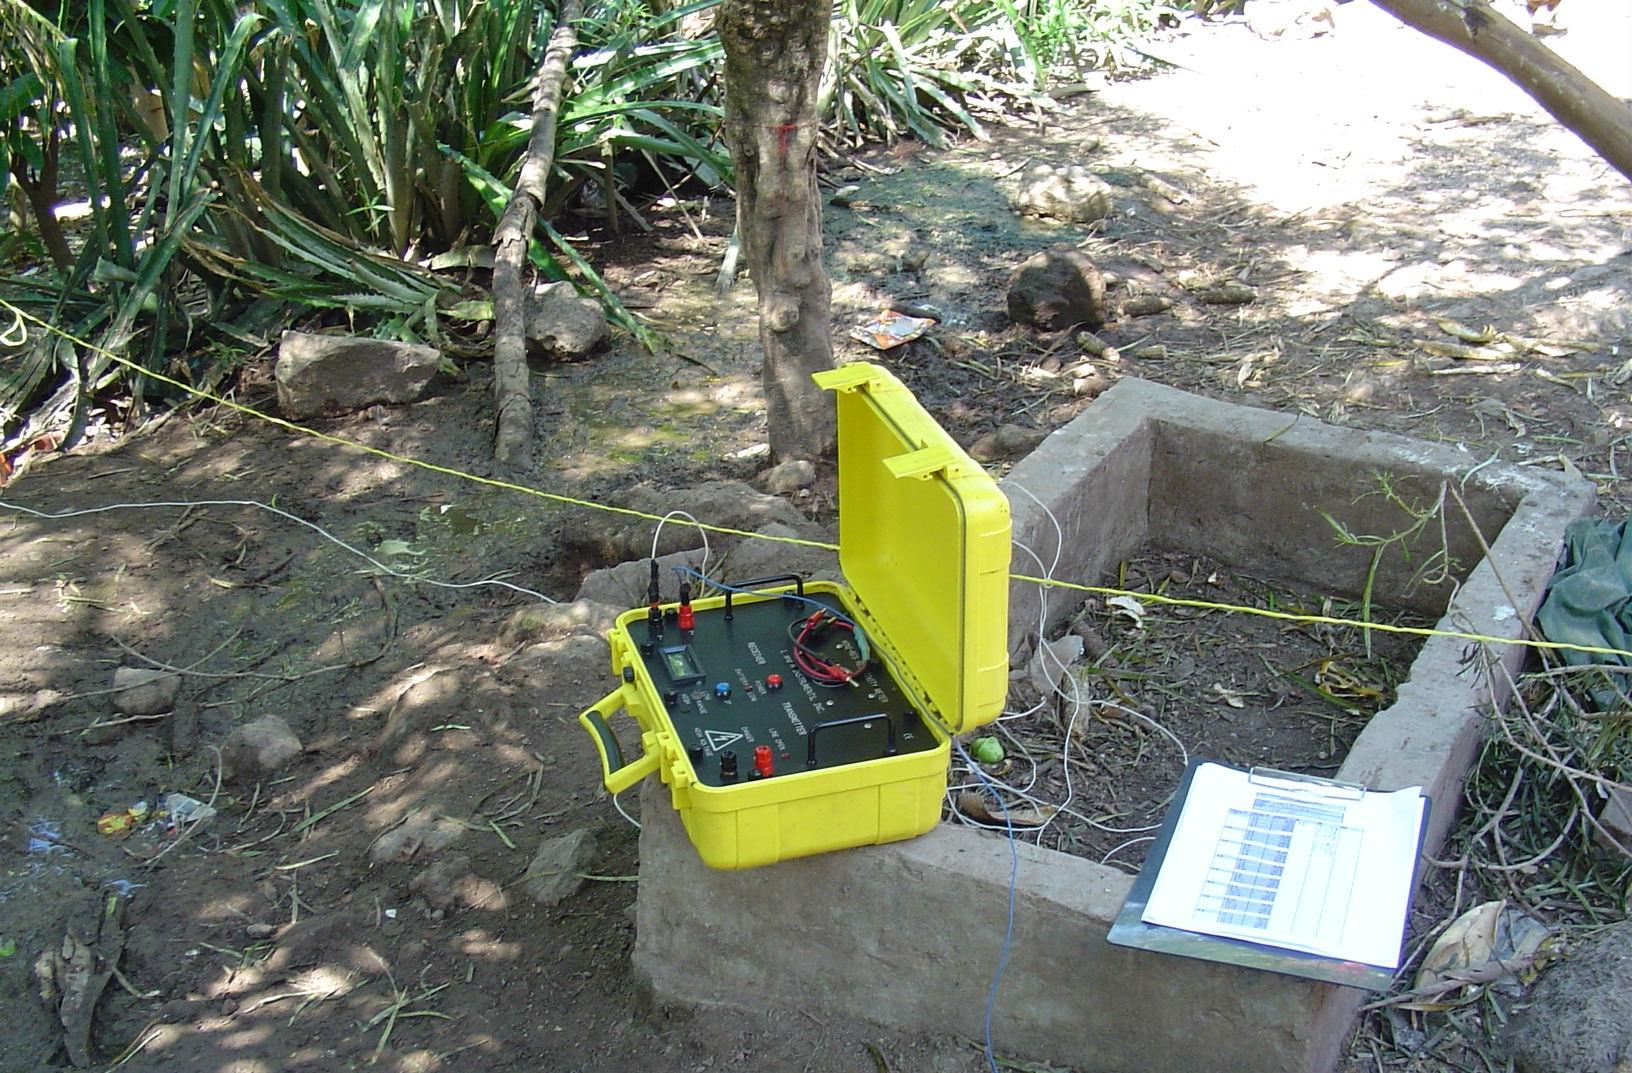 Resistividad eléctrica - Electrical resistivity